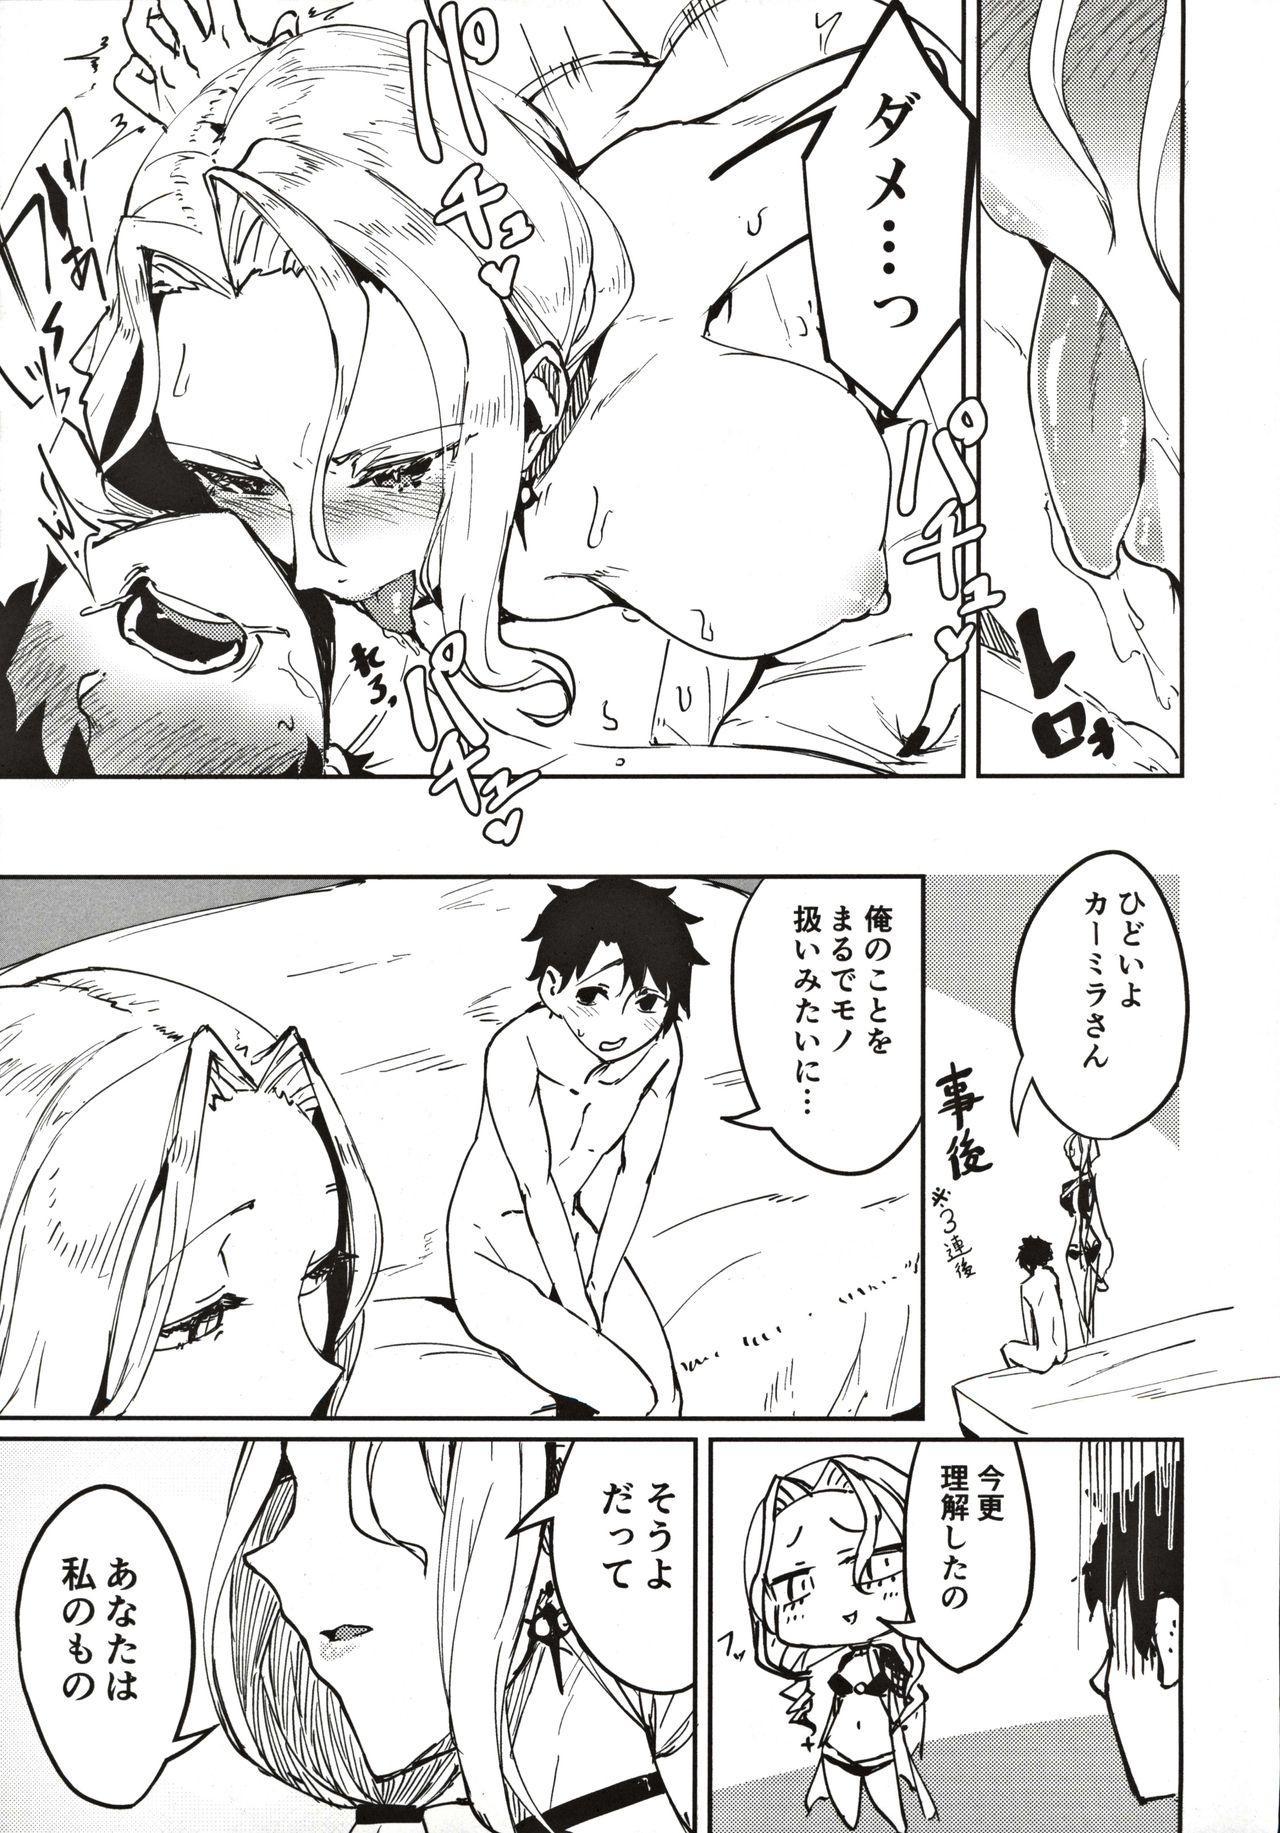 Carmilla-san no Ecchi na no ga Kakitakatta Hon 11